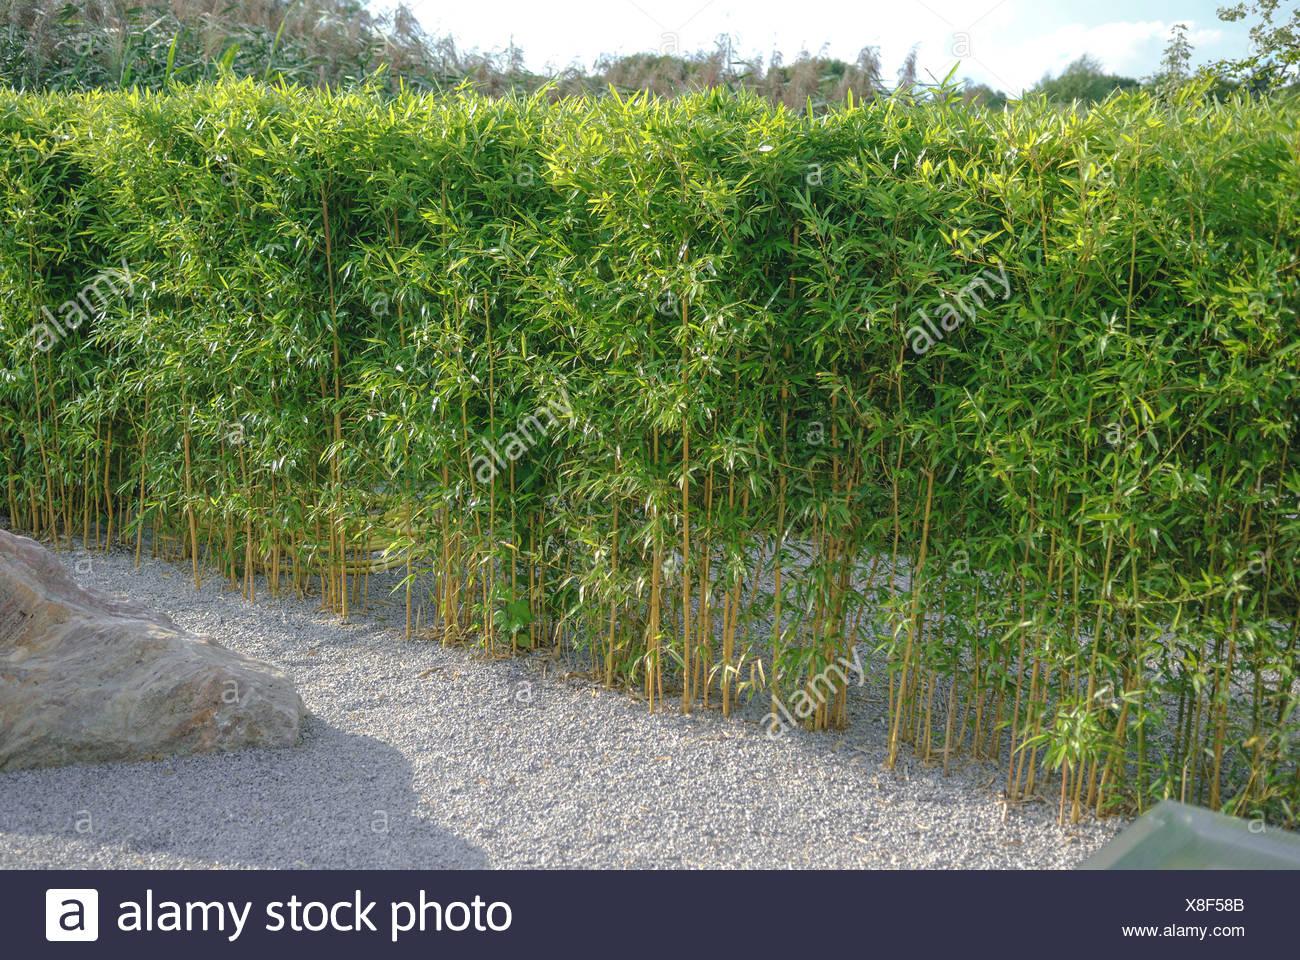 Siepe Di Bambu.Giallo Bambu Scanalato Phyllostachys Aureosulcata Fo